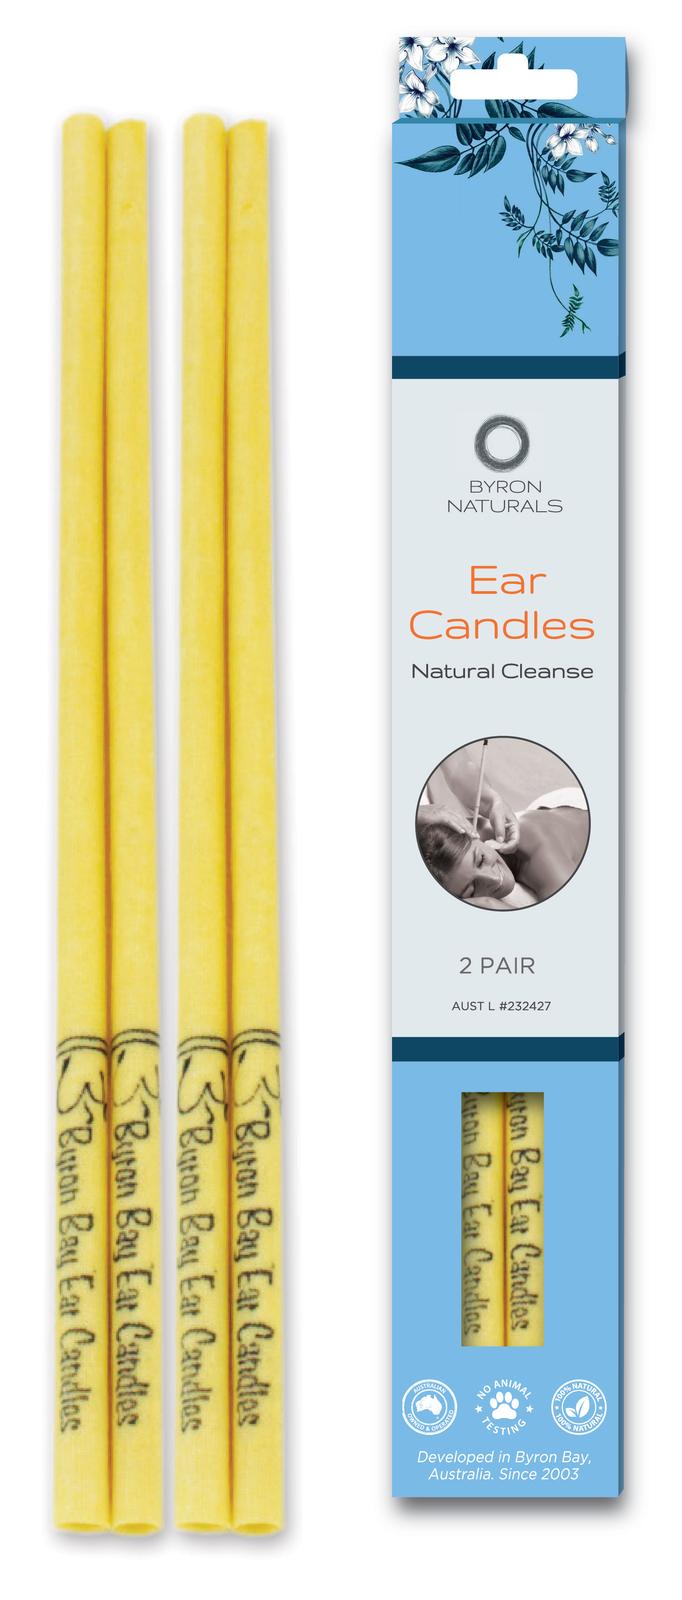 Byron Naturals Ear Candles